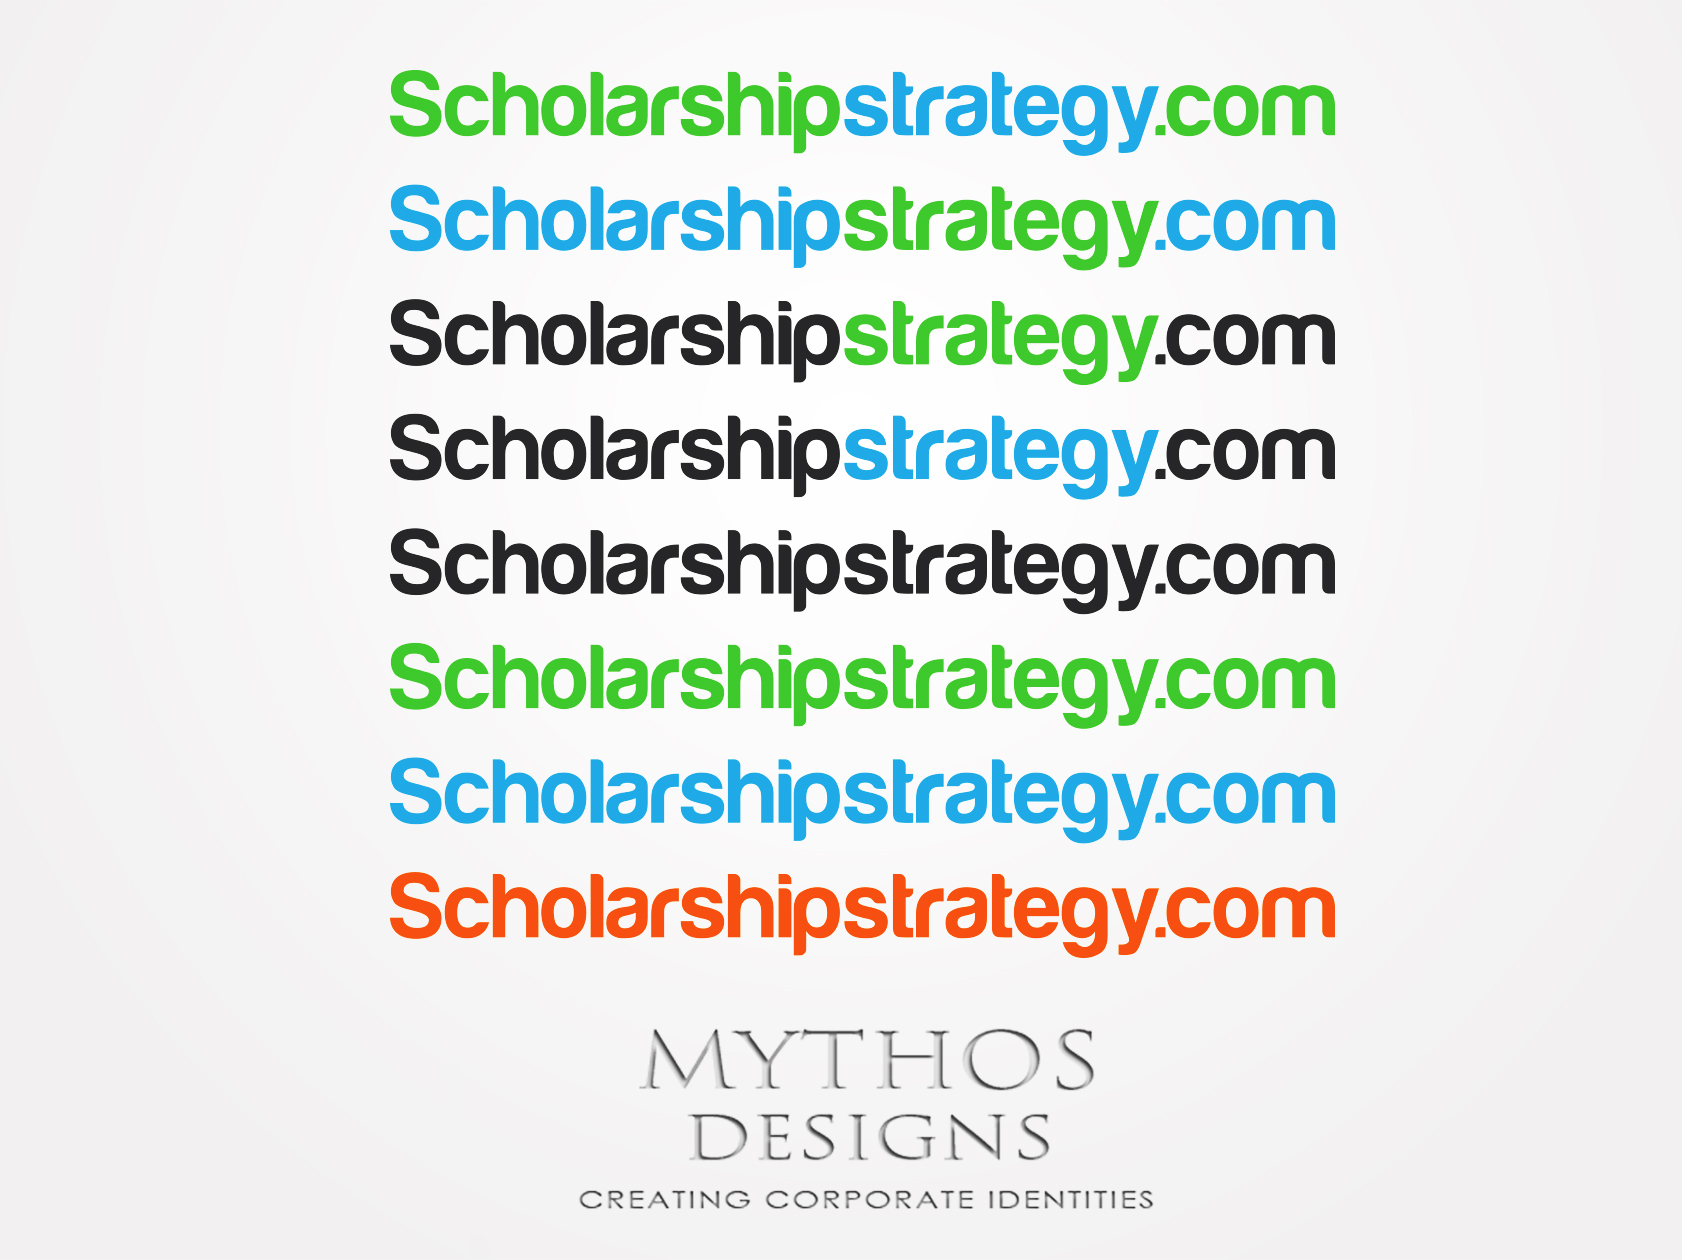 Logo Design by Mythos Designs - Entry No. 198 in the Logo Design Contest Captivating Logo Design for Scholarshipstrategy.com.